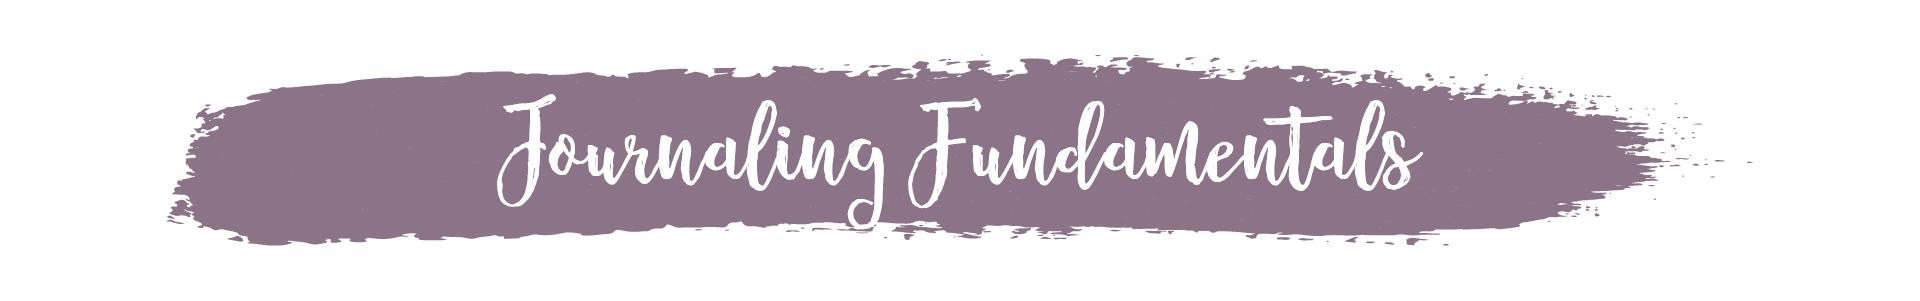 Journaling Fundamentals header